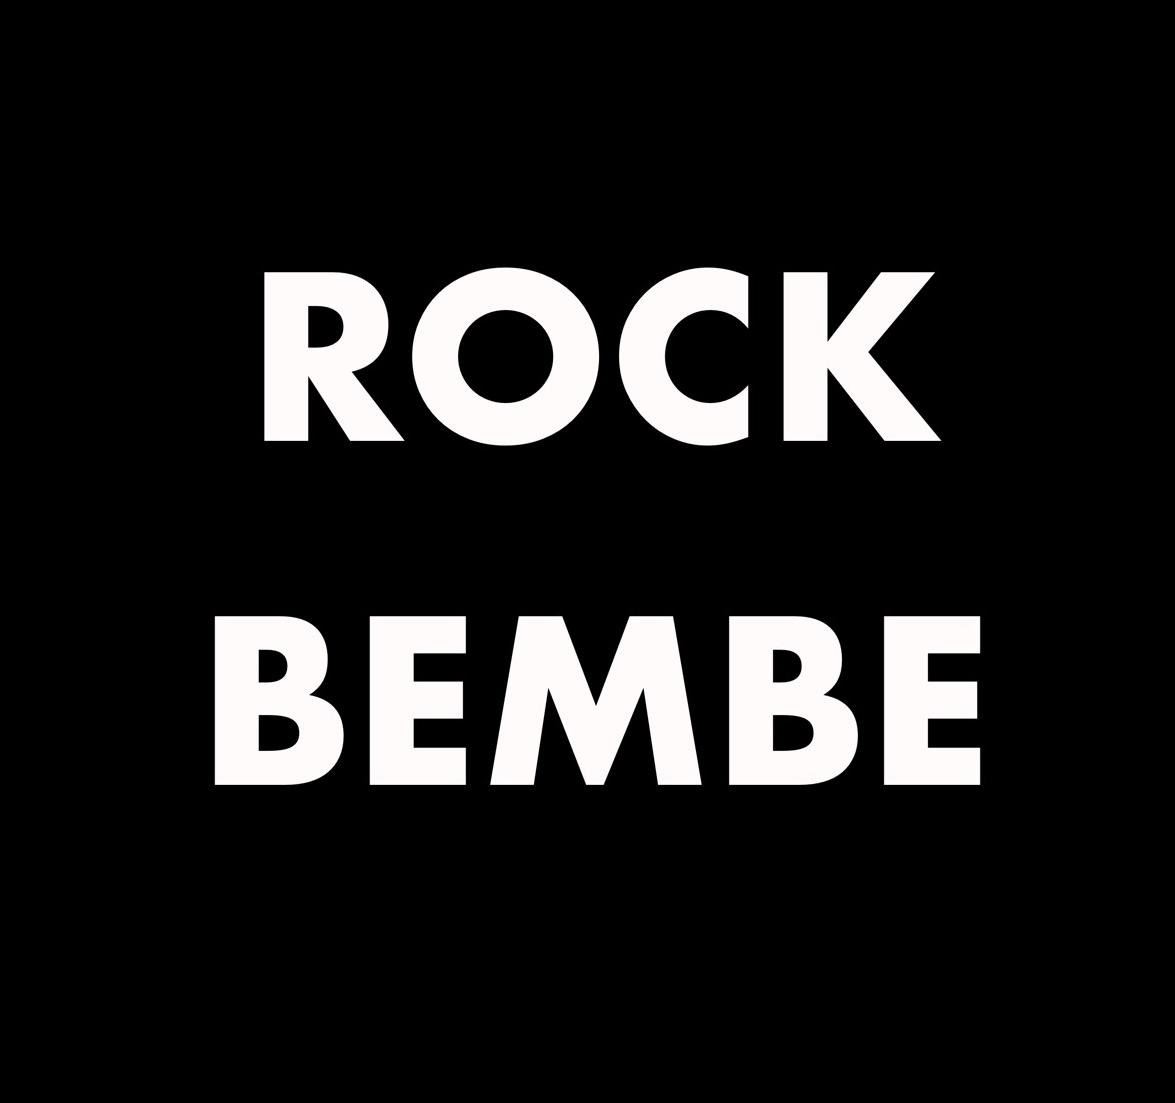 Rock Bembe